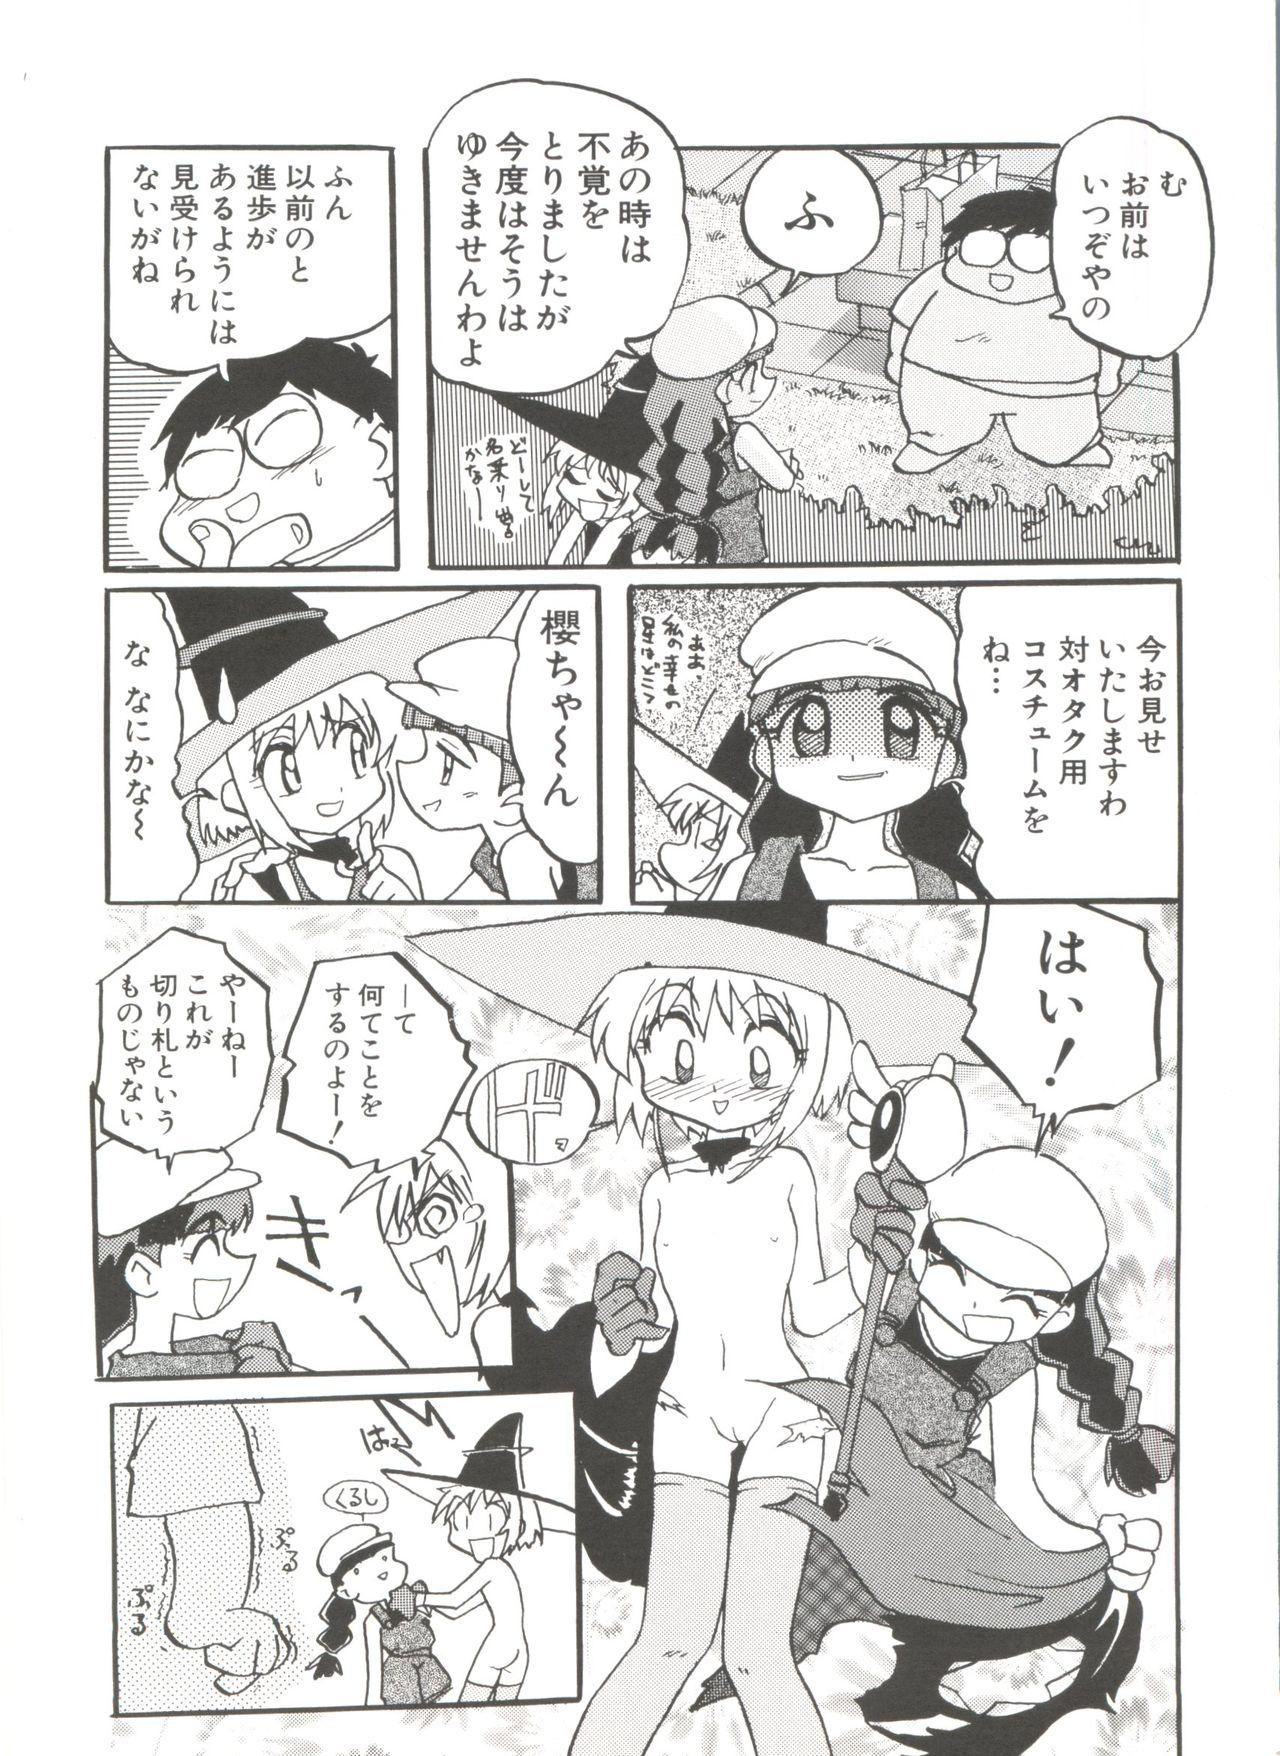 [Anthology] Denei Tamatebako 8 - Utakata no Tenshi-tachi II (Various) 123